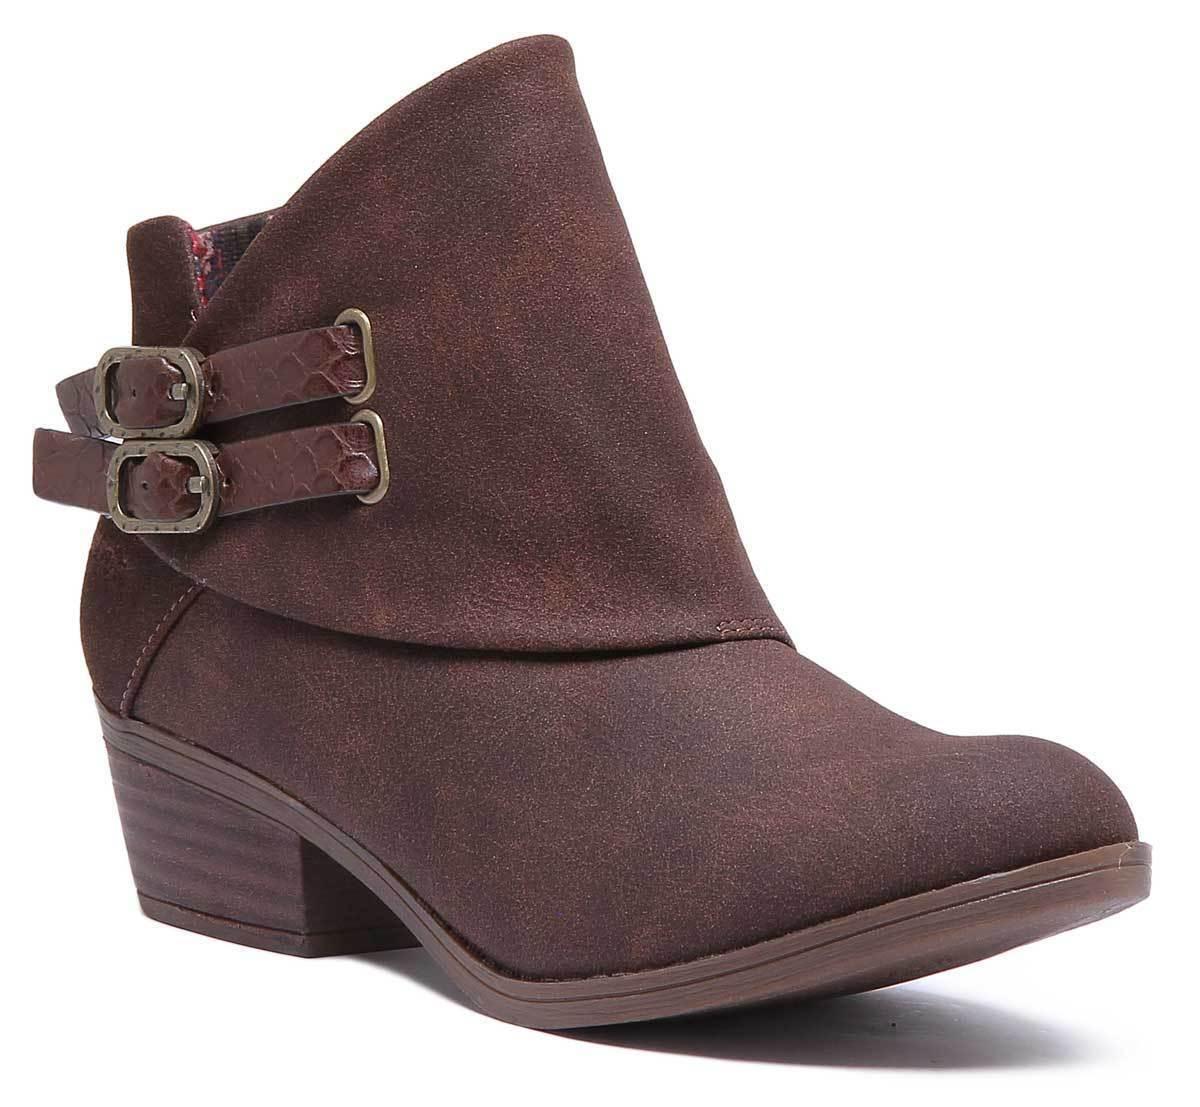 Blowfish Sistee damen Synthetic Leather Tobacco braun Ankle Stiefel UK Größe 3 - 8